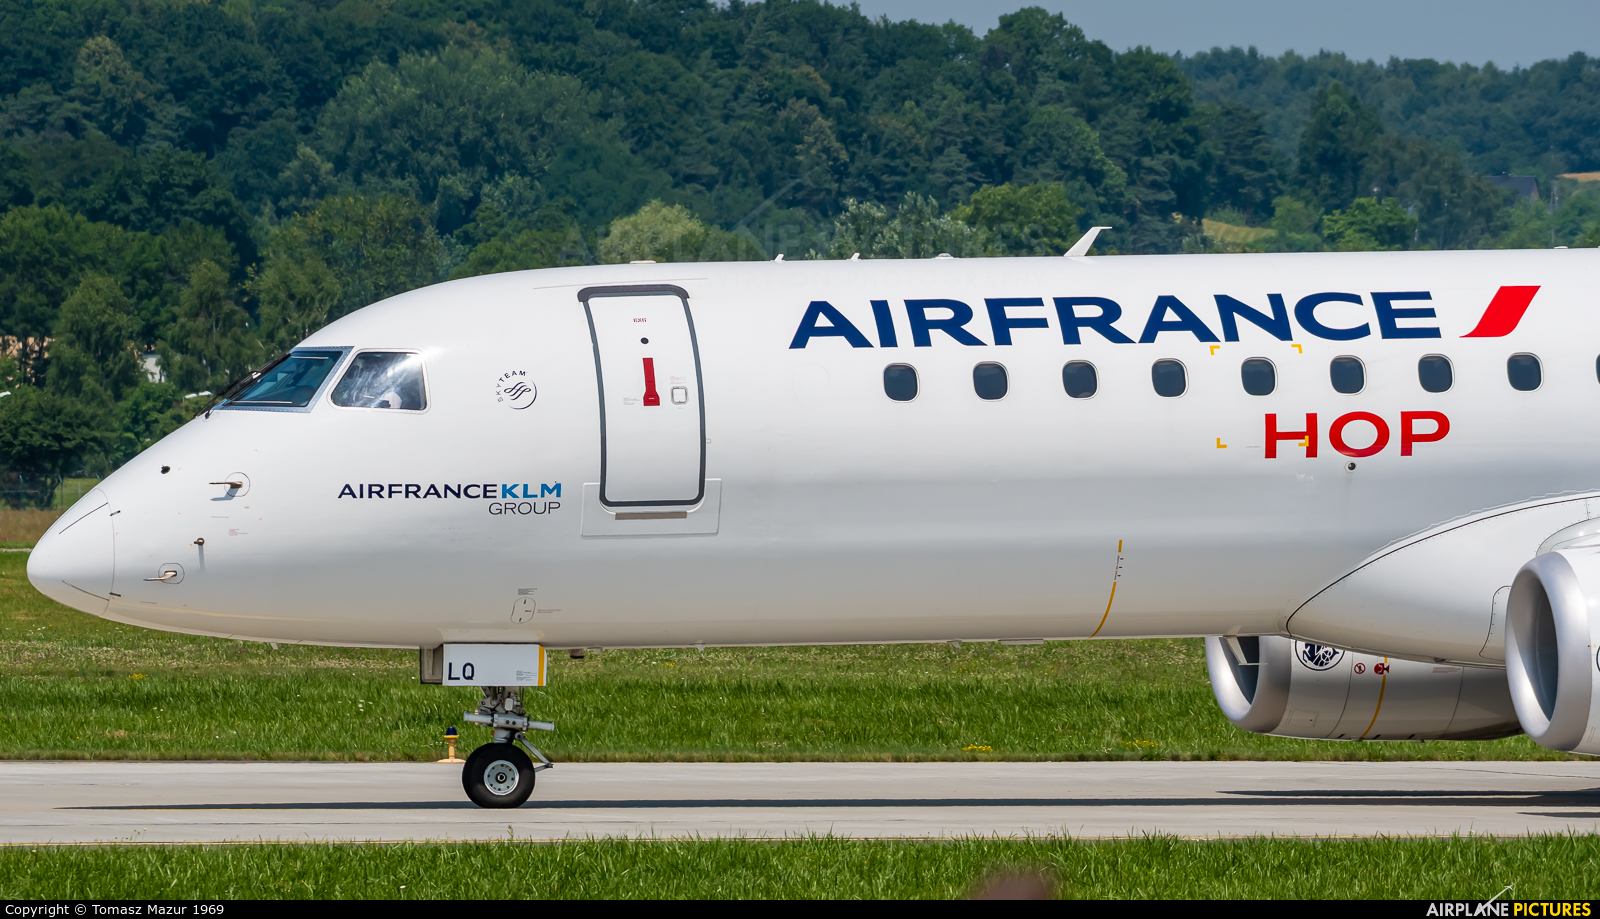 Air France - Hop! F-HBLQ aircraft at Kraków - John Paul II Intl